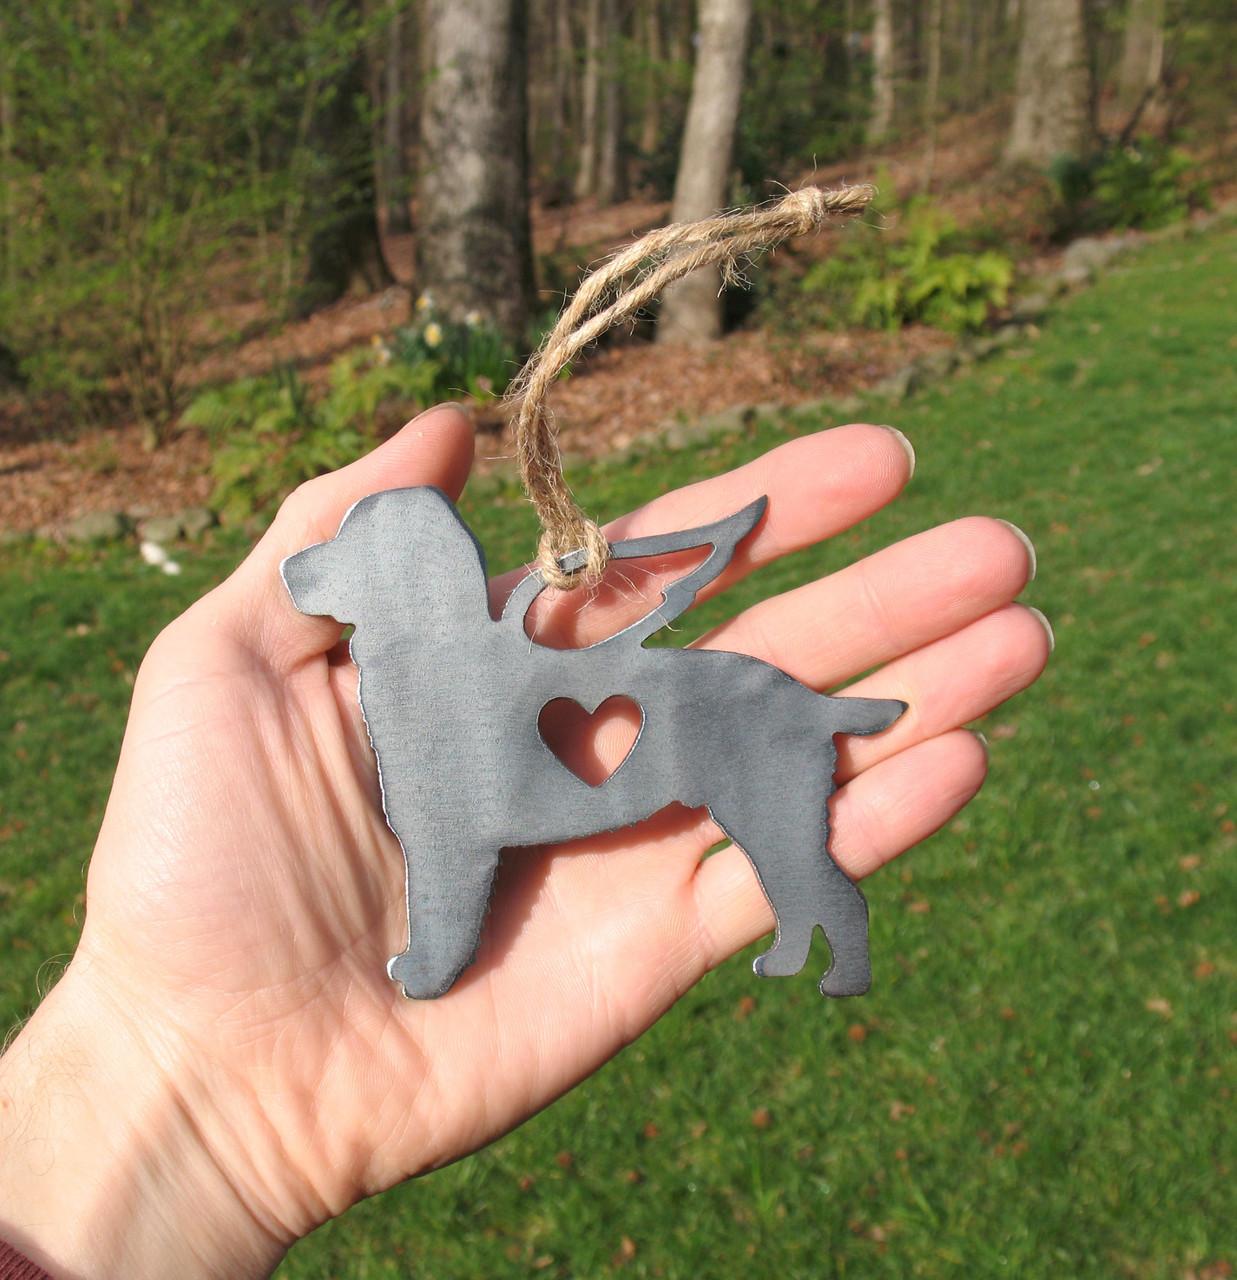 Springer Spaniel Dog Ornament 1 Pet Memorial W/ Angel Wings - Pet Loss Dog Sympathy Remembrance Gift - Metal Dog Christmas Ornament